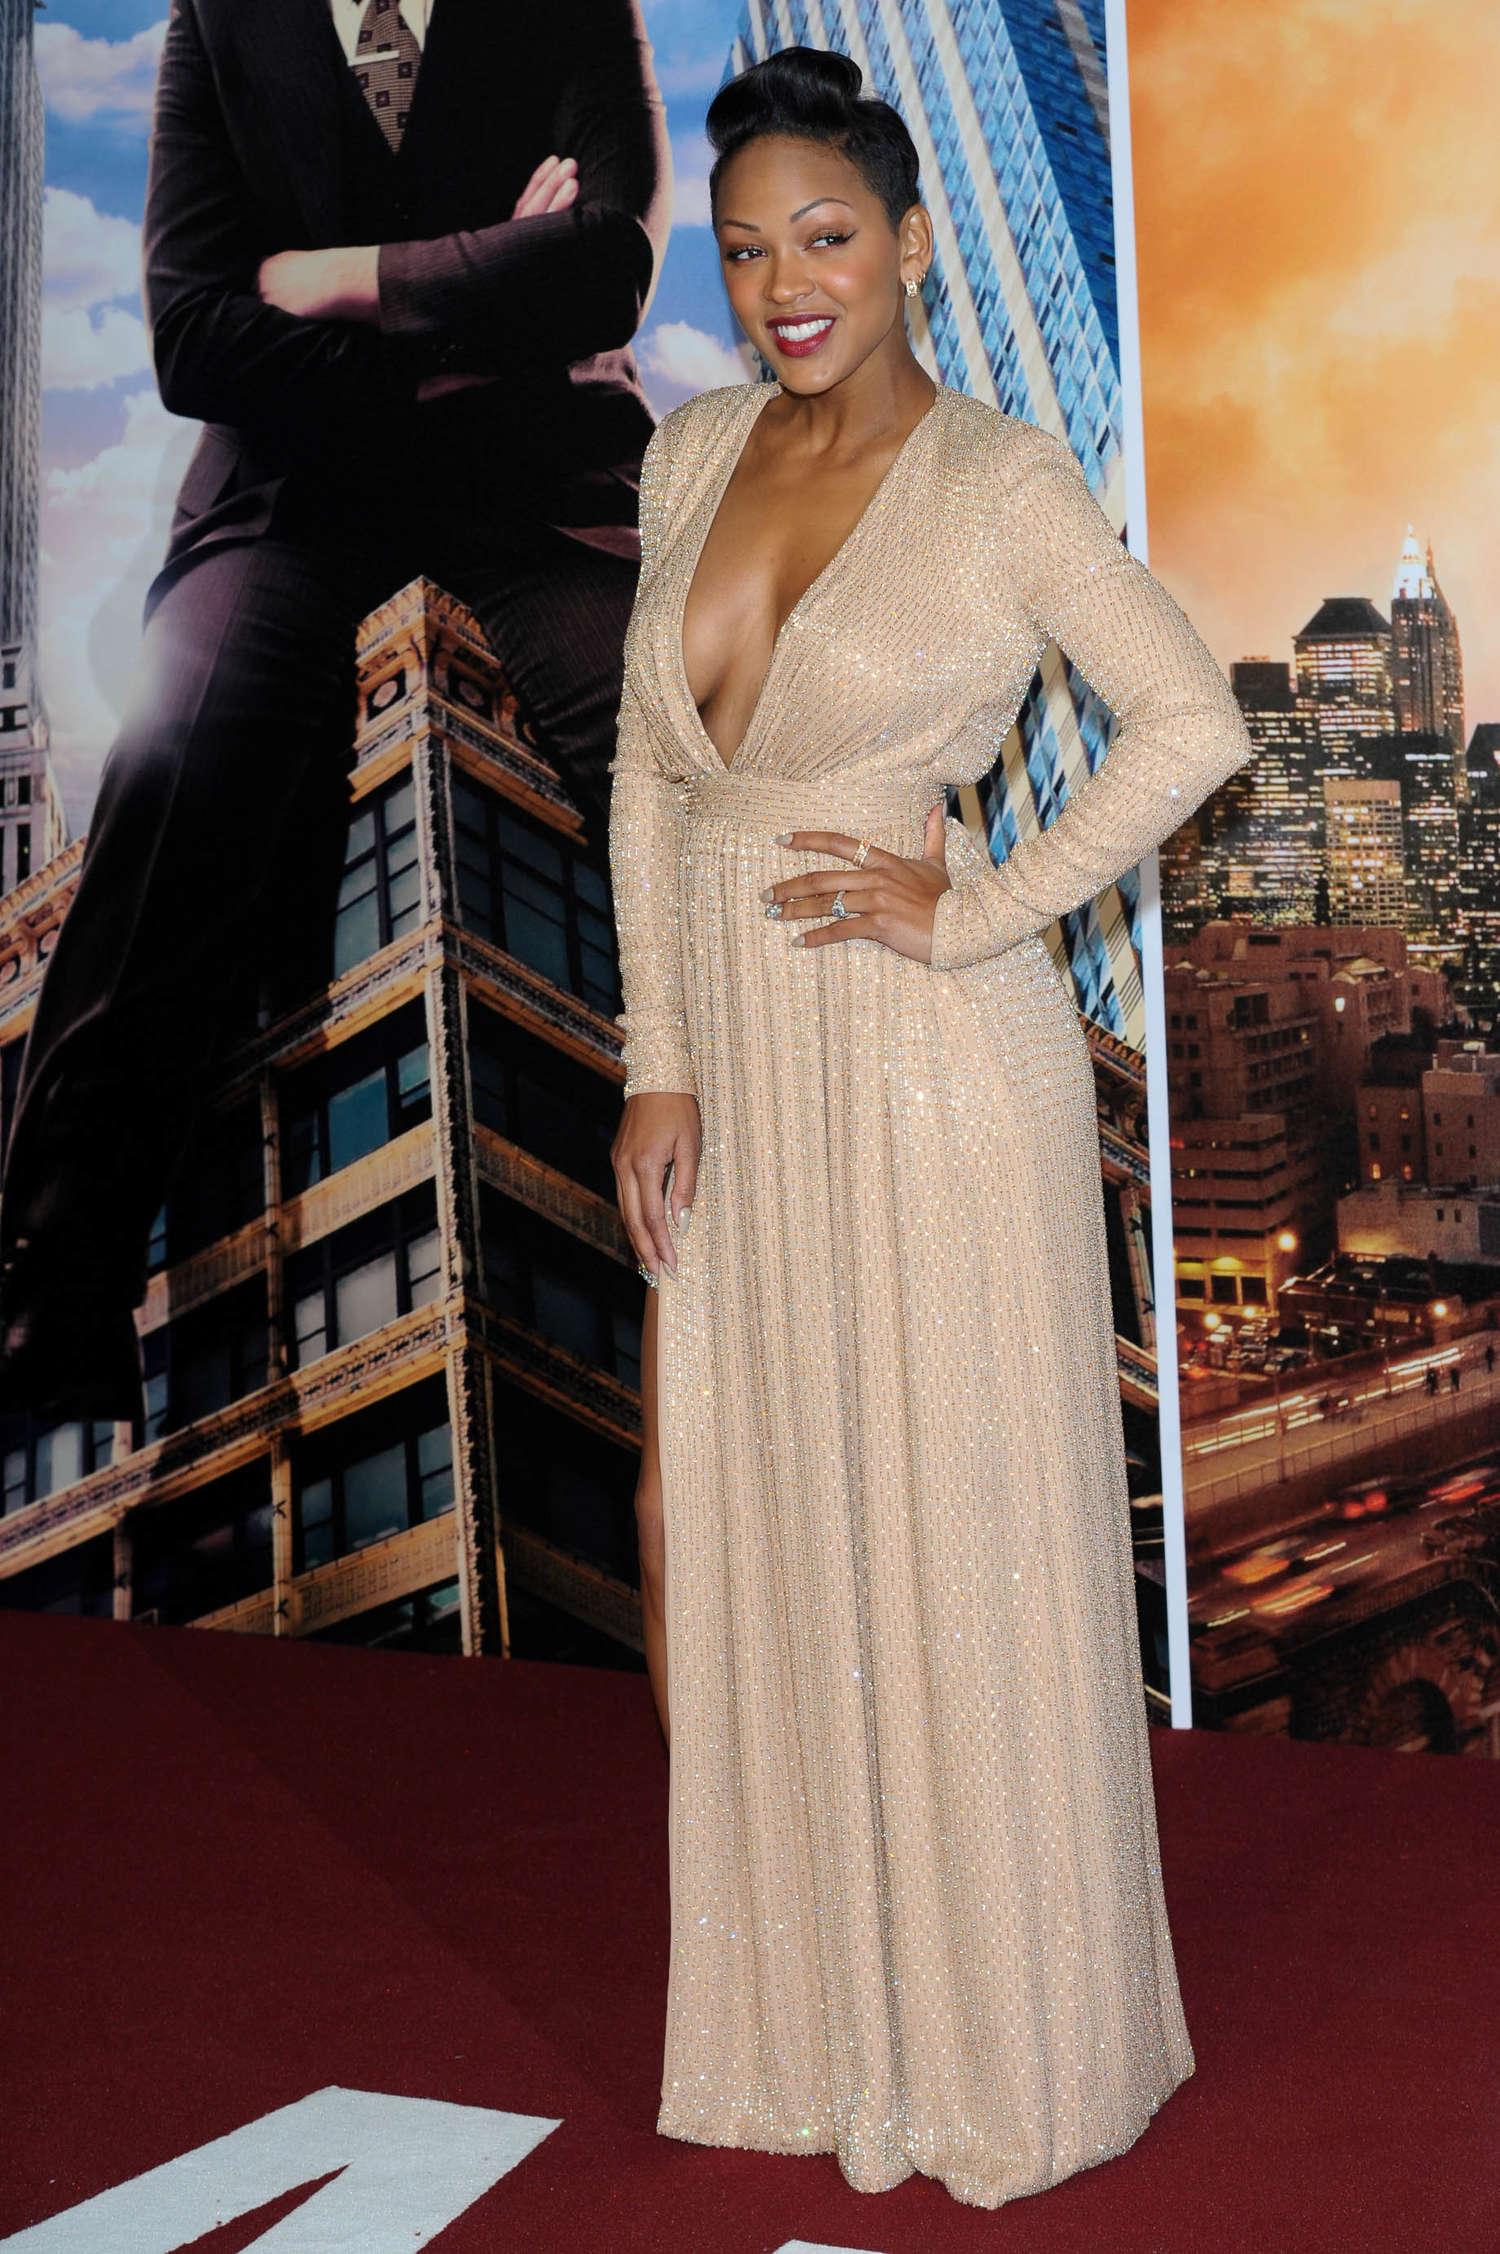 Meagan Good - Anchorman 2: The Legend Continues premiere